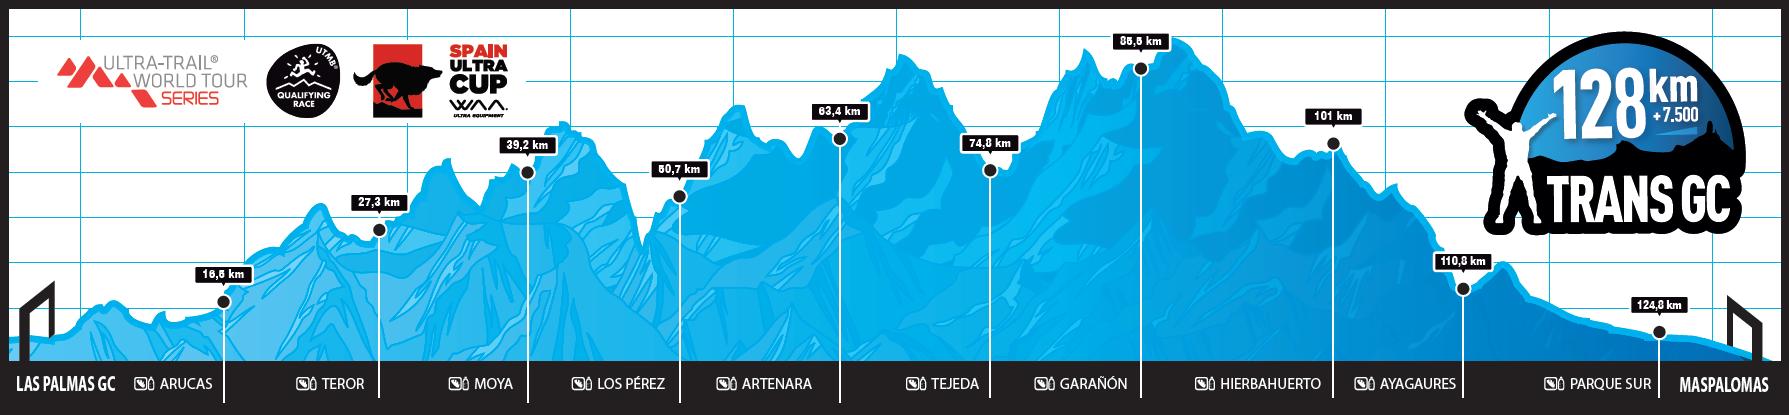 perfil 128km - UTWT TRANSGRANCANARIA 2018 : AURELIEN COLLET 2EME !